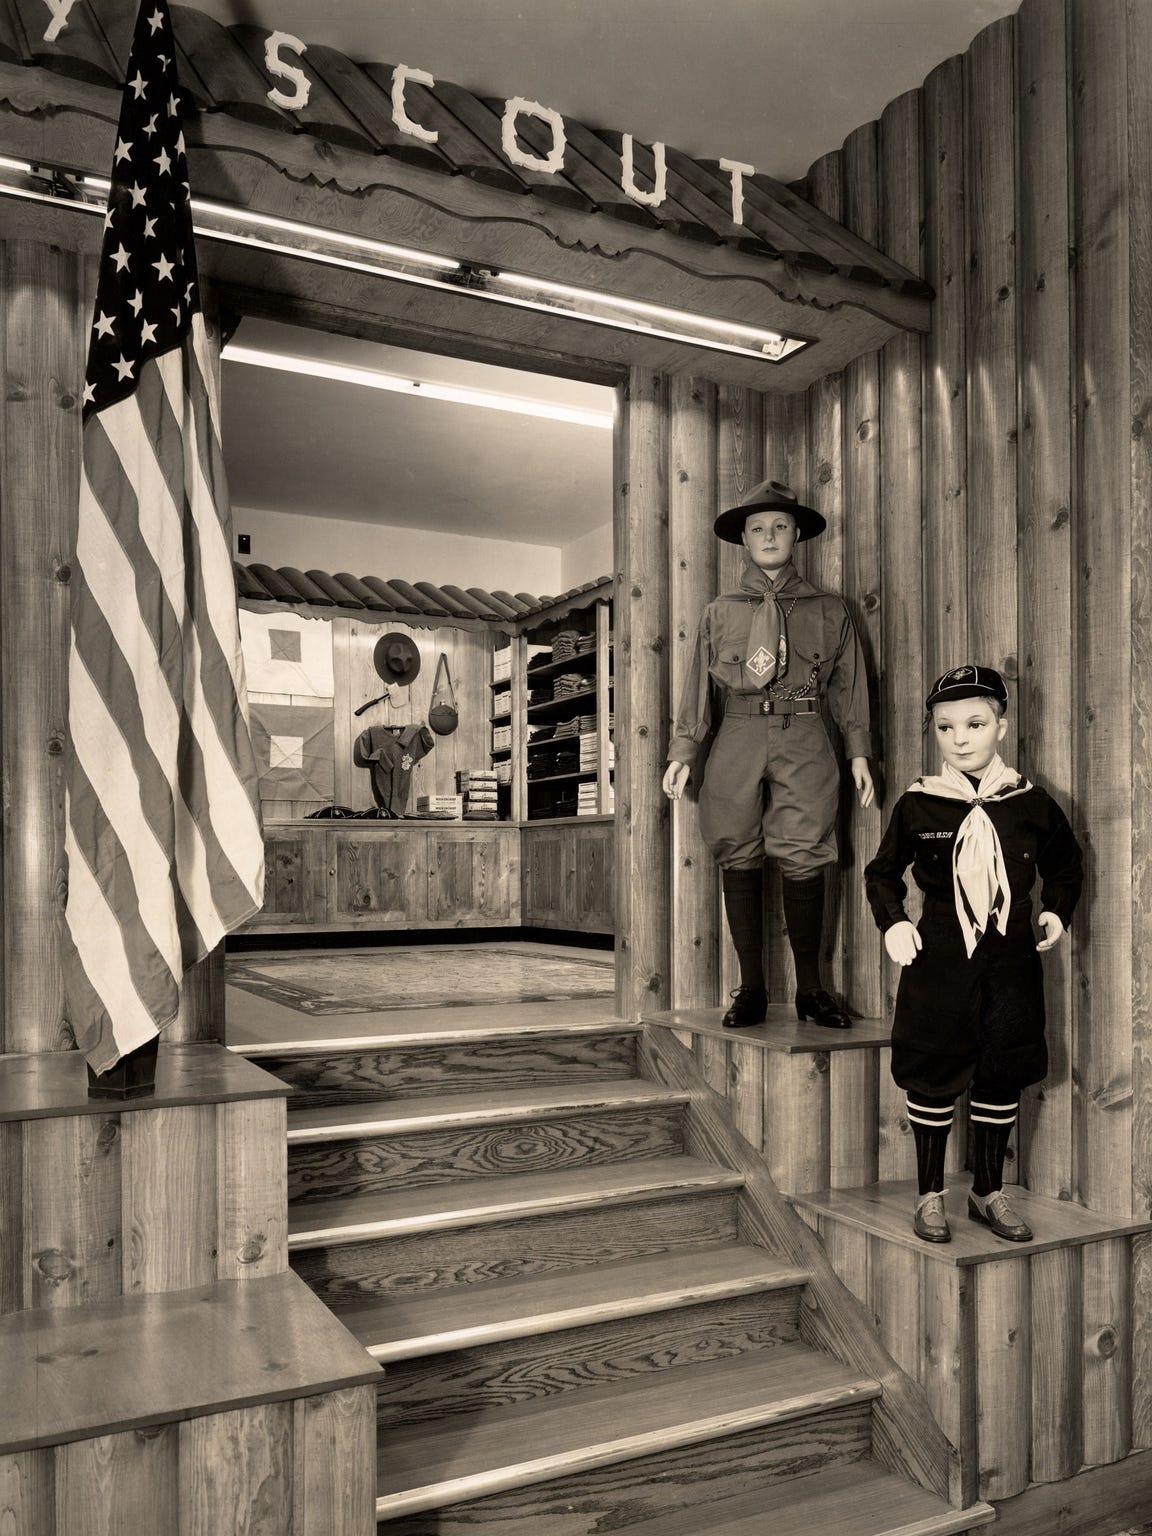 Kositchek's Boy Scout Department, mid-20th Century.